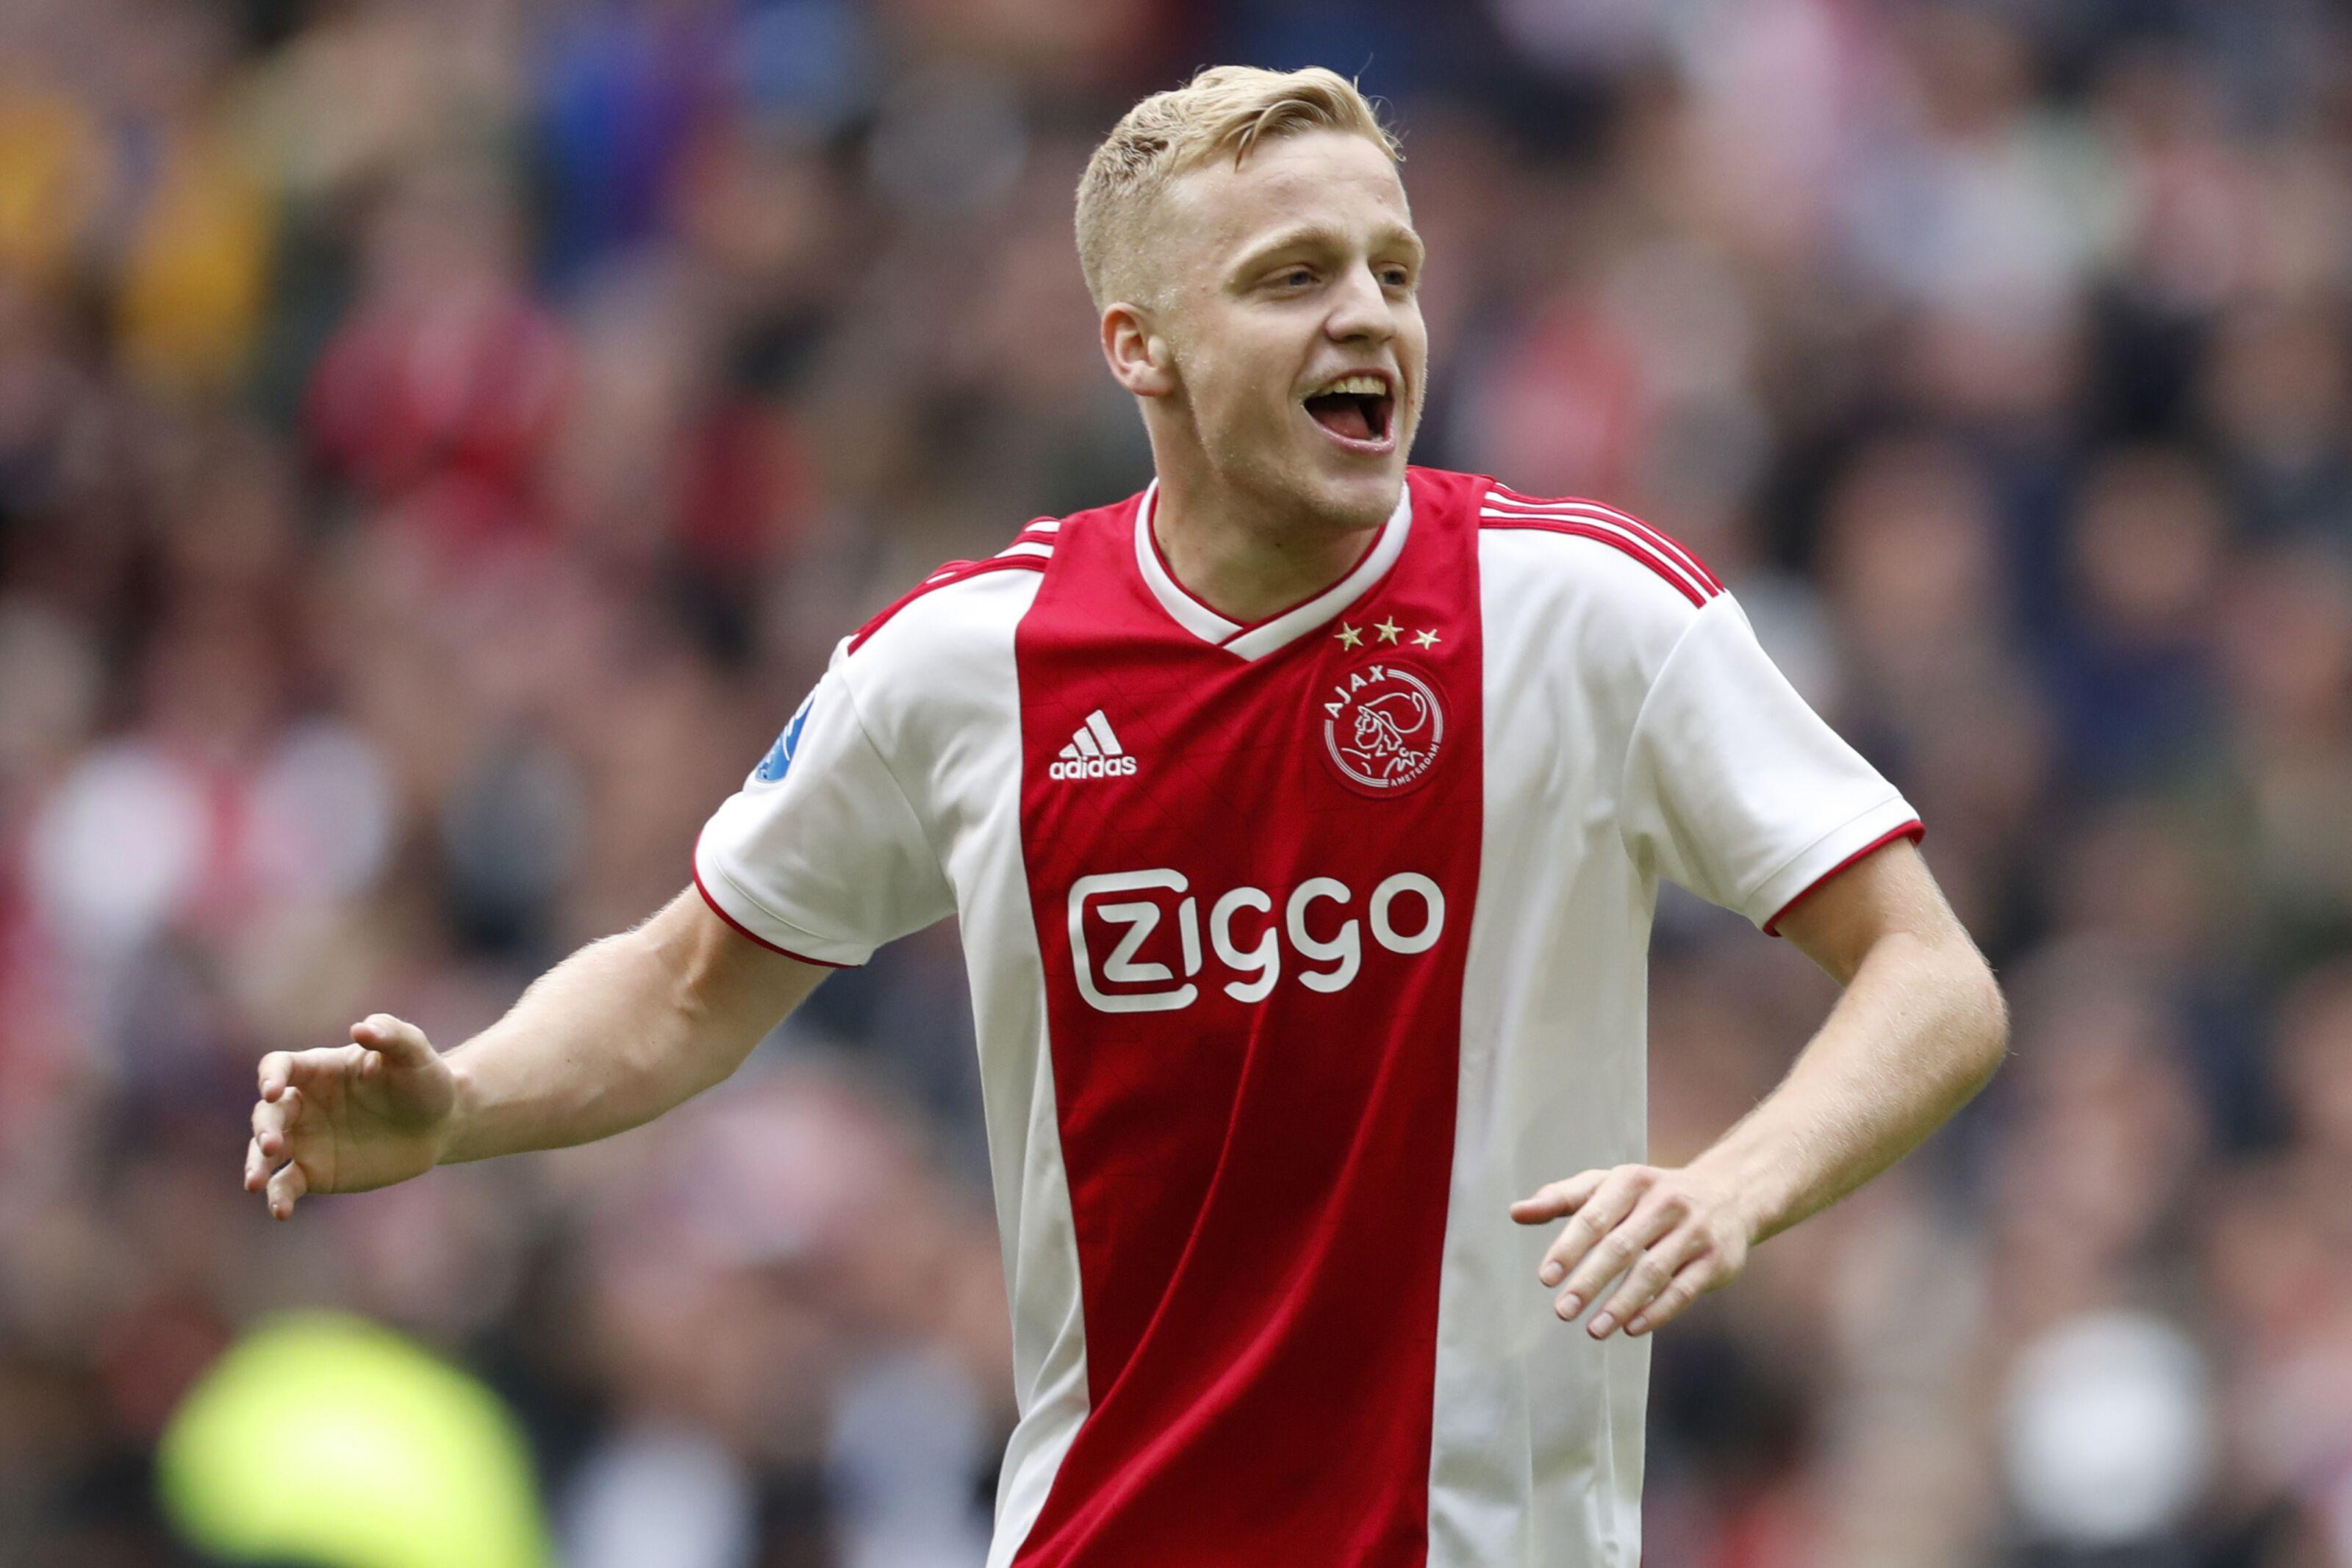 Tottenham may see Donny van de Beek as a transfer bargain